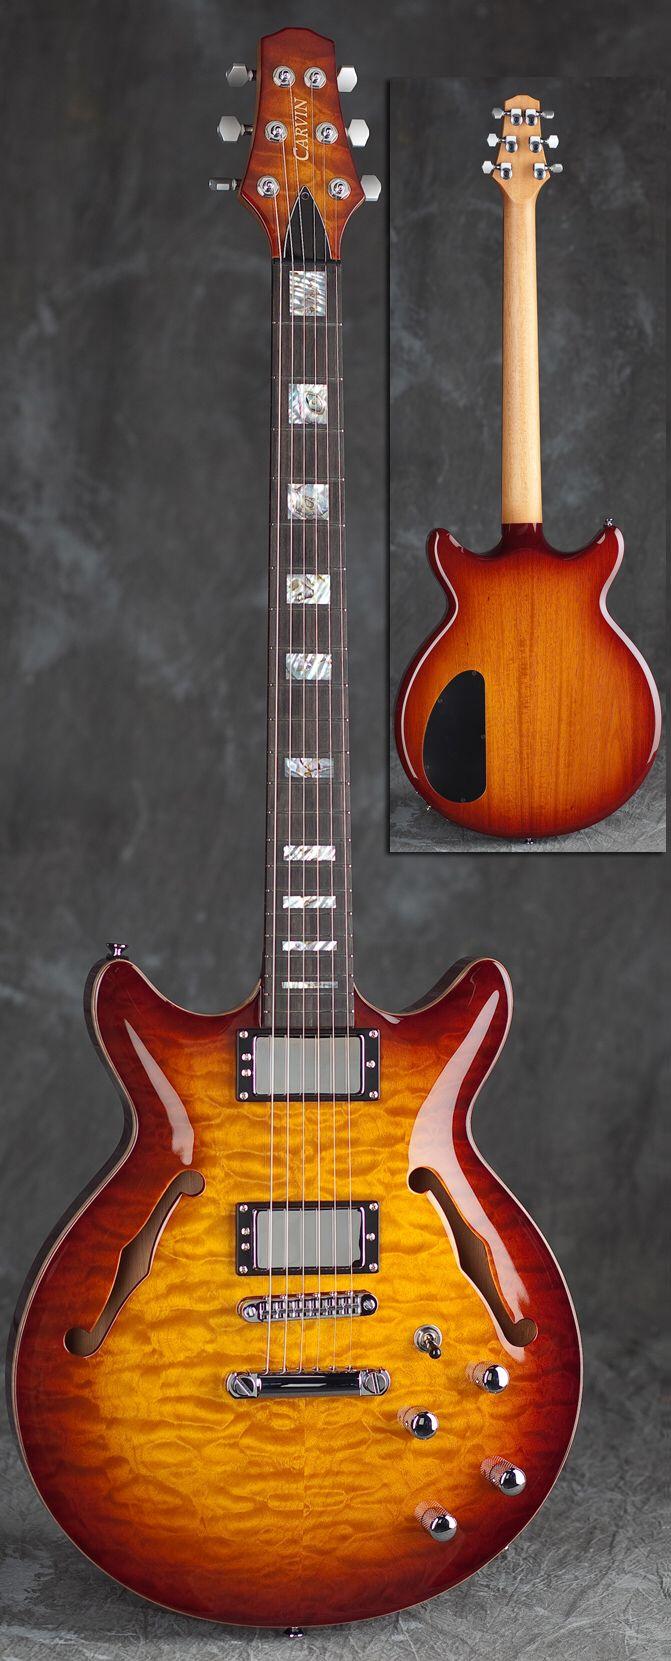 carvin dc400 guitar wiring diagrams [ 671 x 1661 Pixel ]